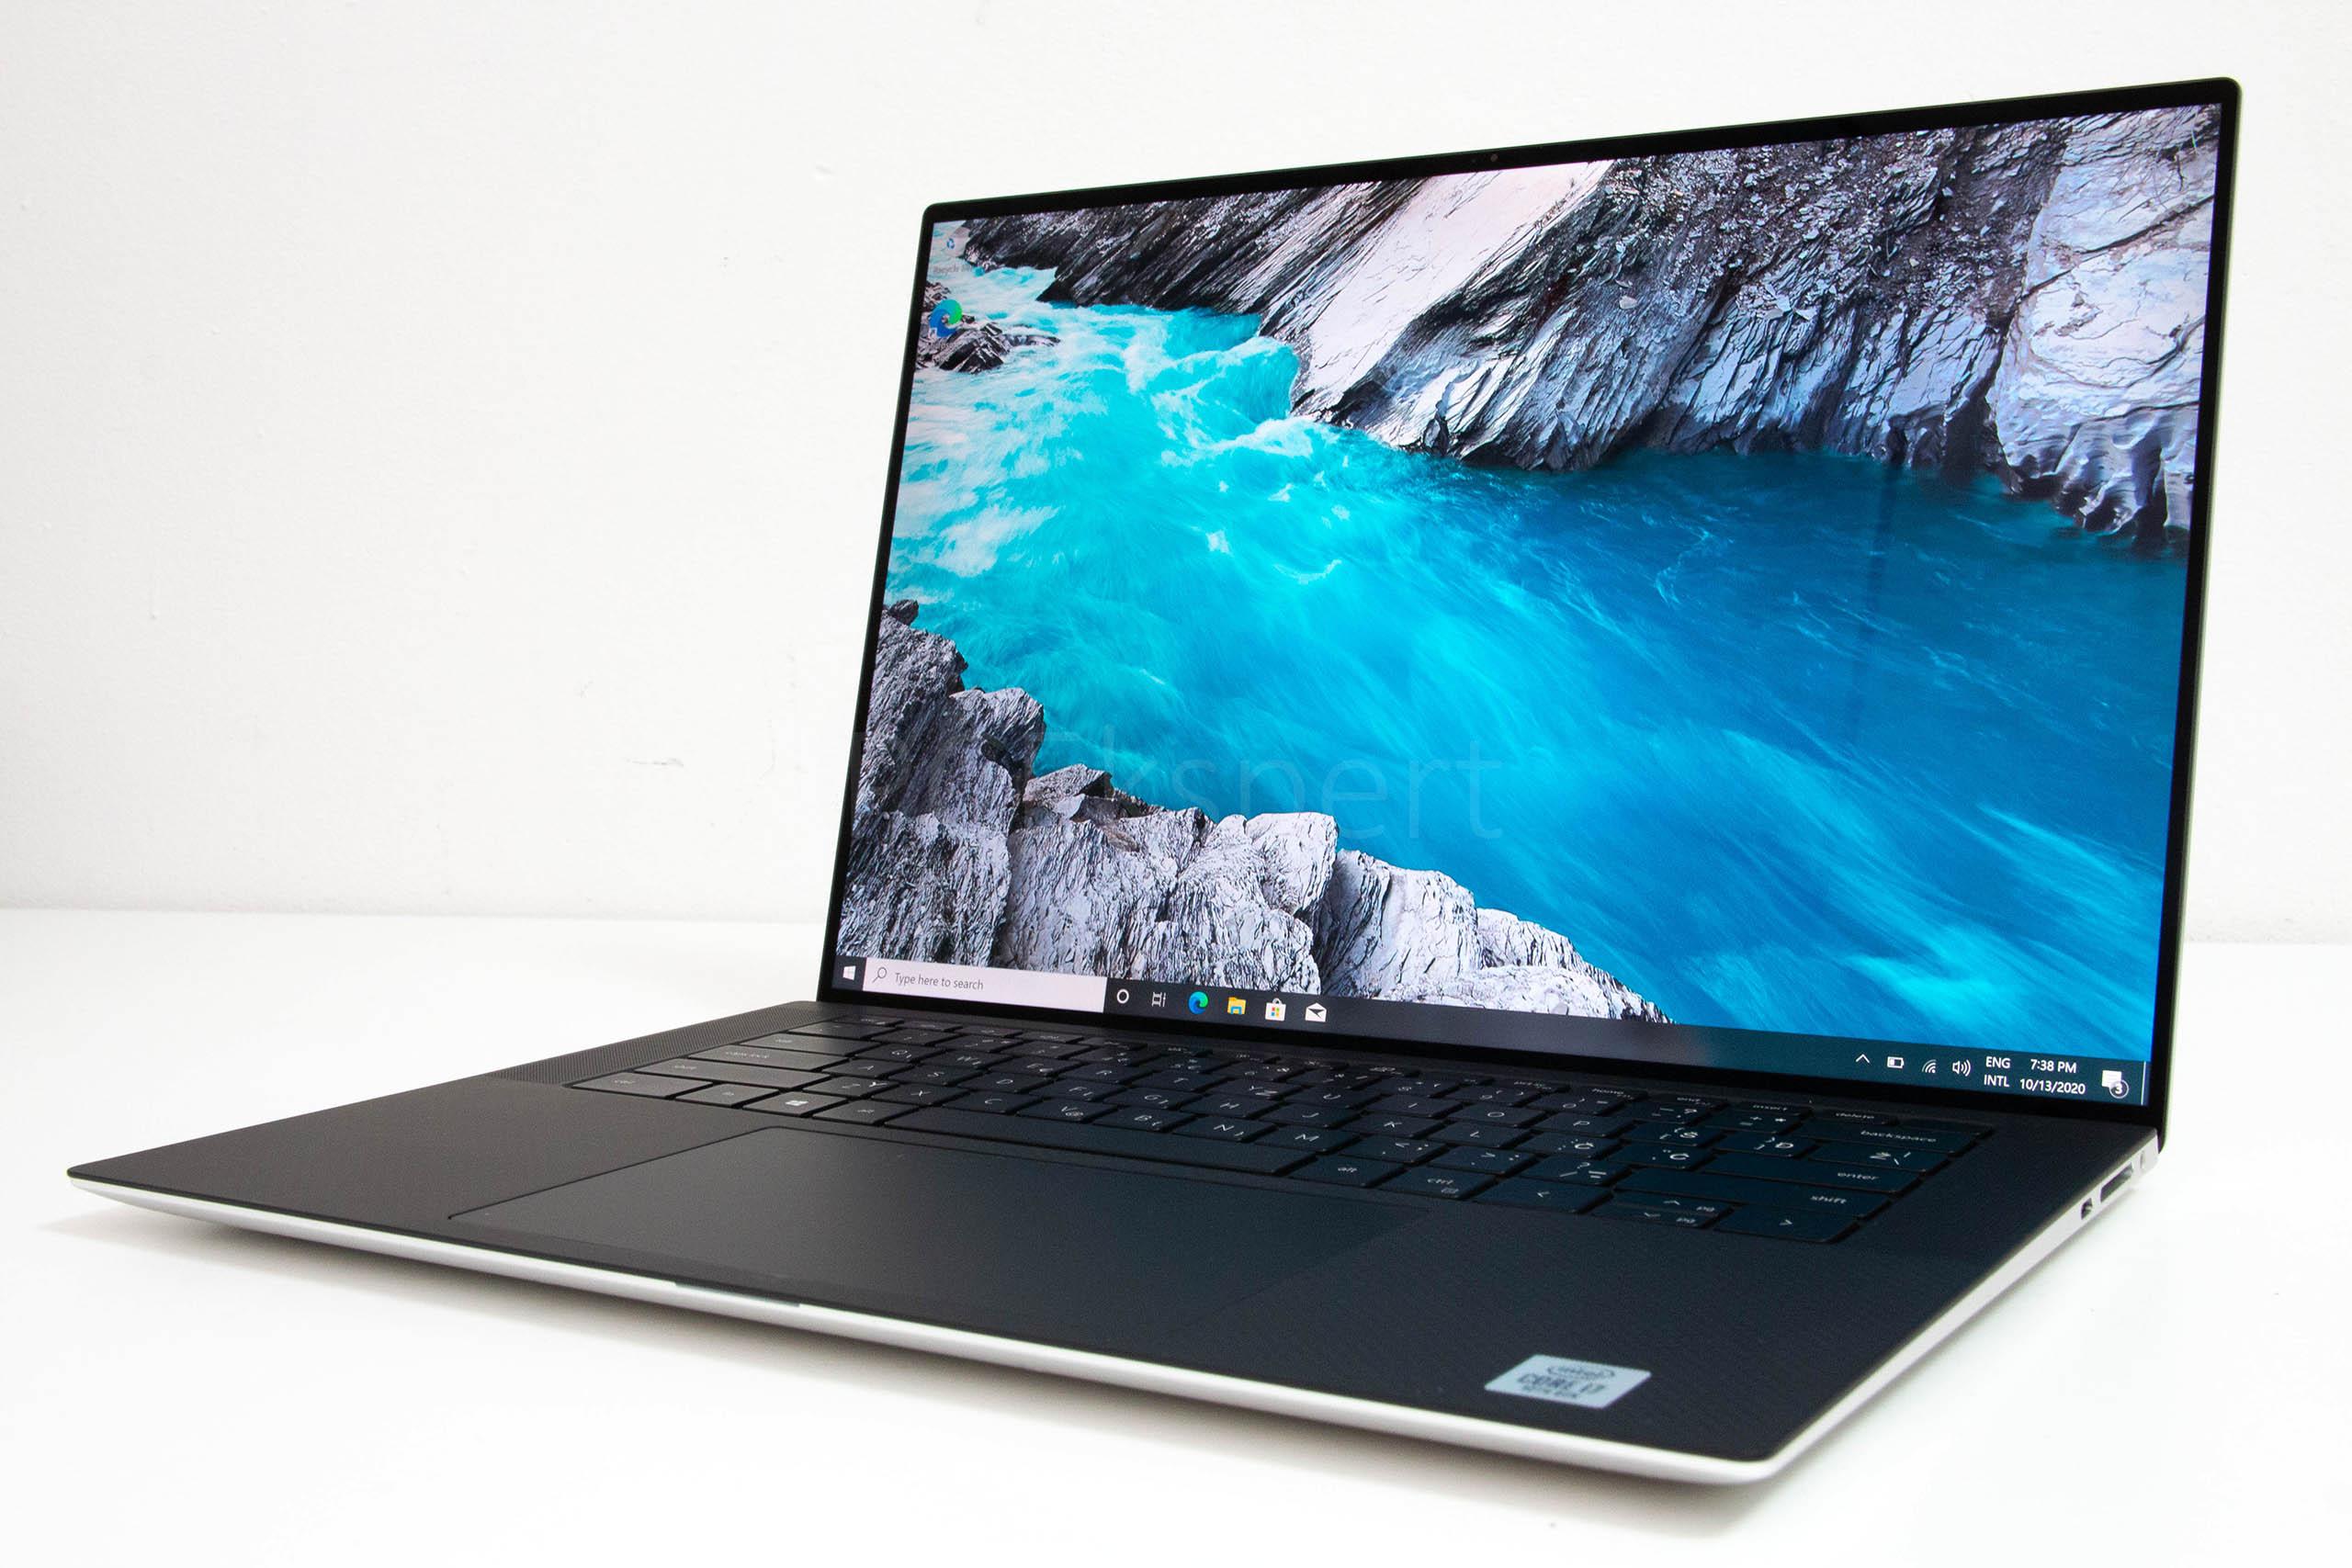 Dell XPS 15 9500 recenzija